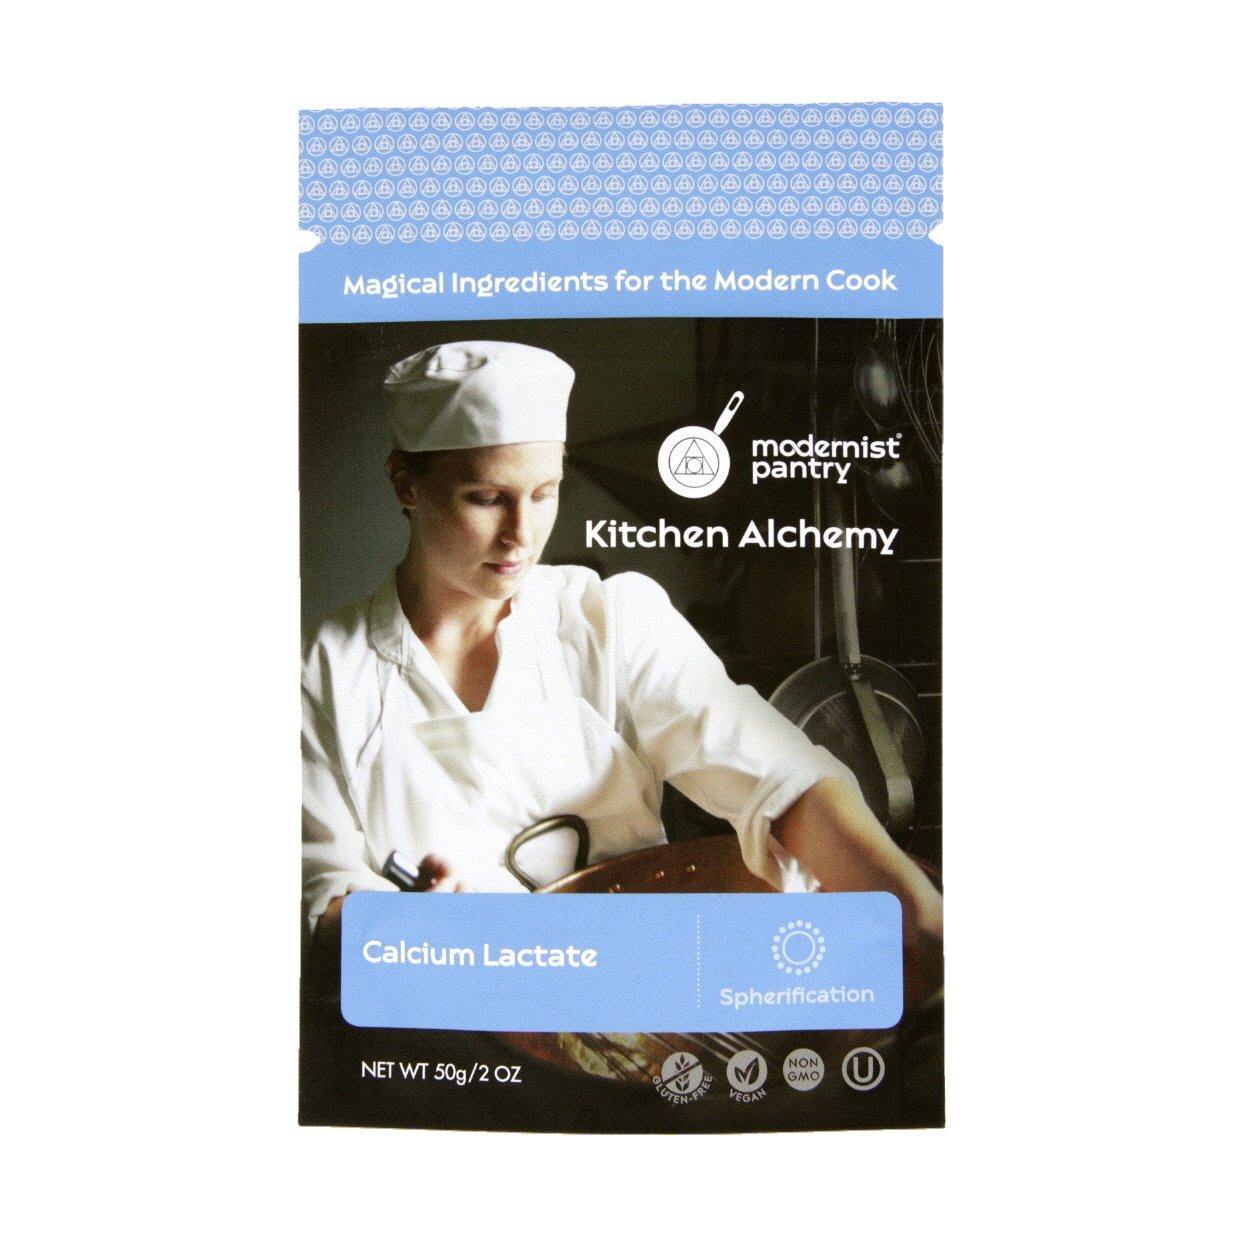 Pure Calcium Lactate ⊘ Non-GMO ☮ Vegan ✡ OU Kosher Certified - 50g/2oz